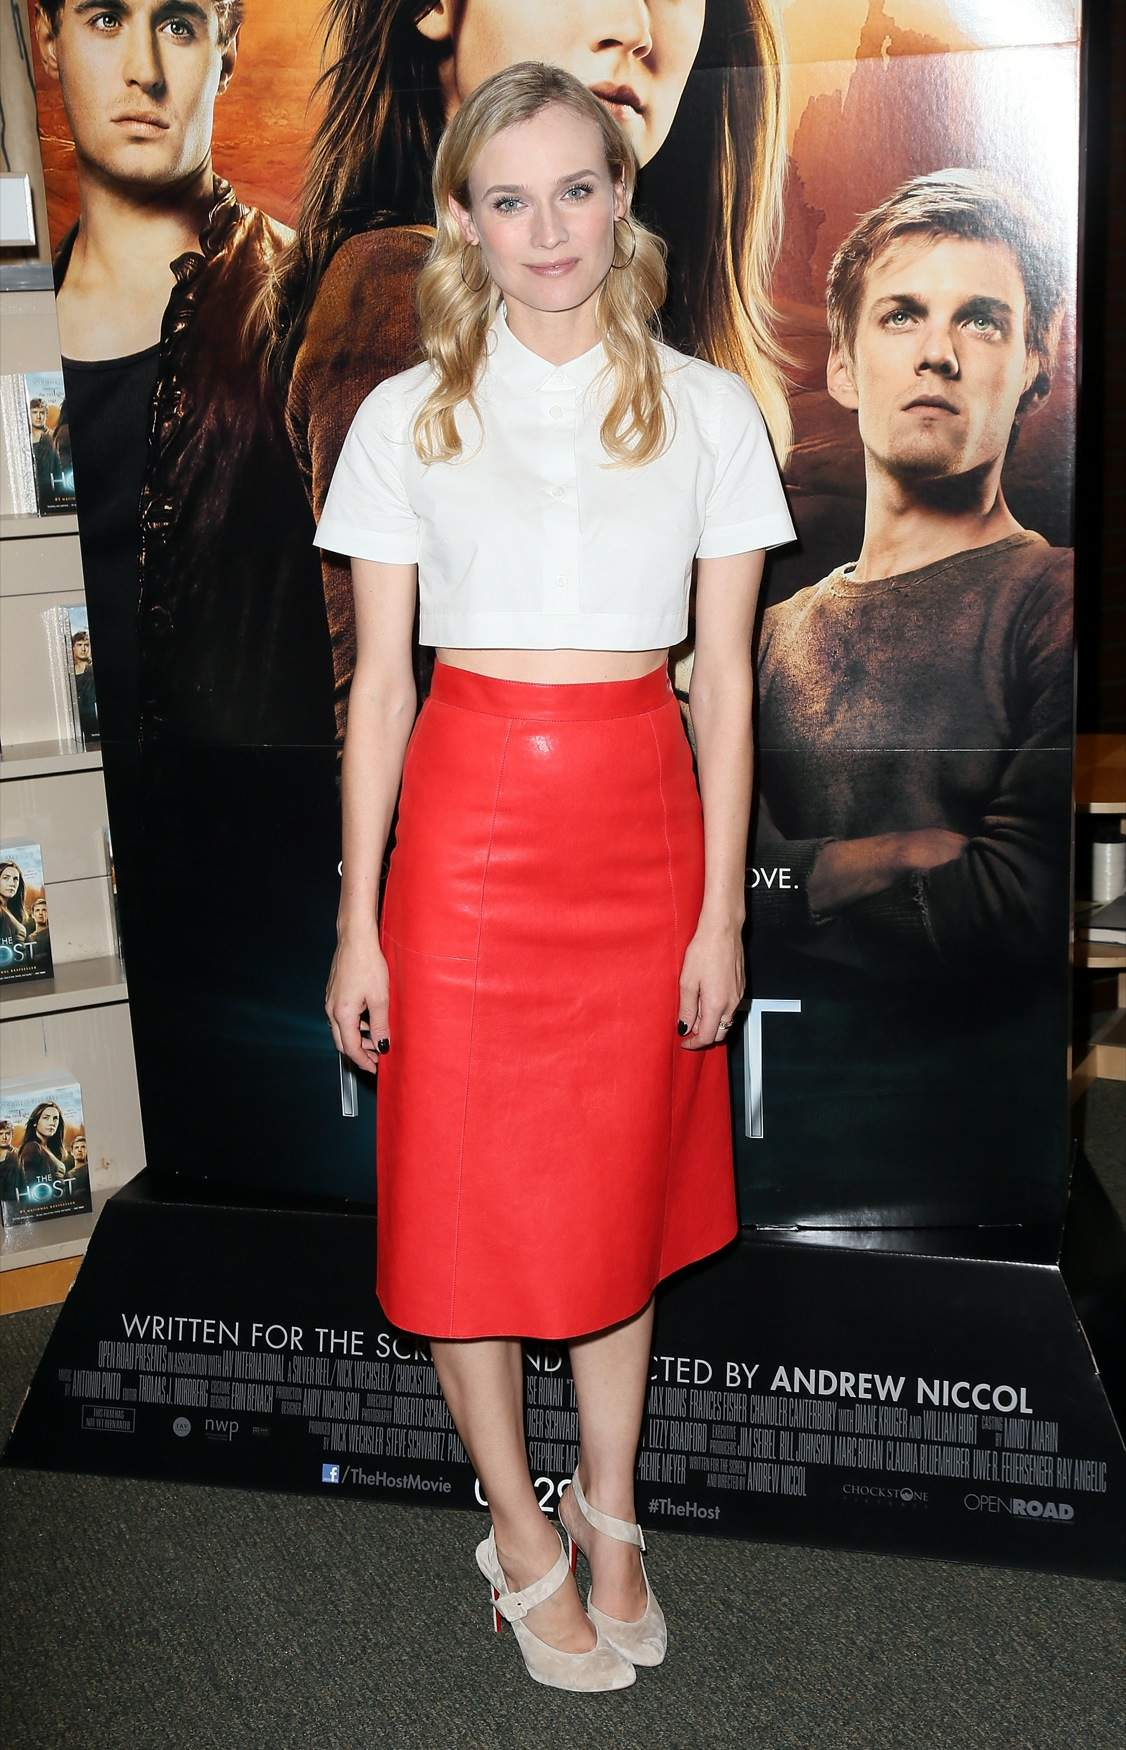 Diane Kruger Celebrate the Film Release of The Host 080.jpg